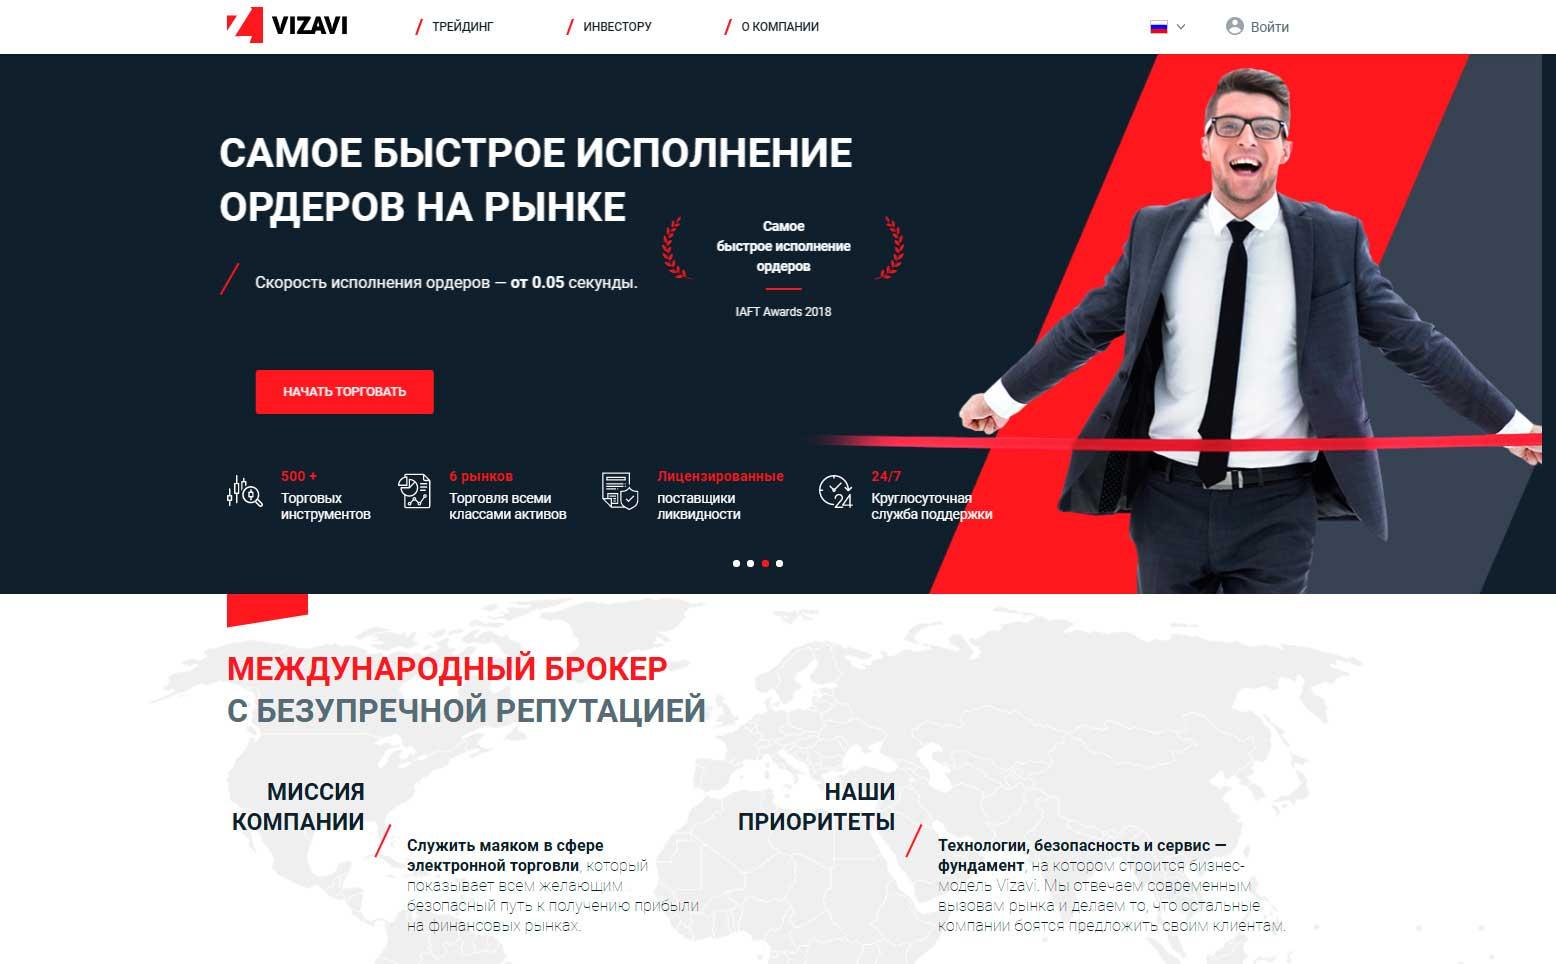 vizavi официальный сайт